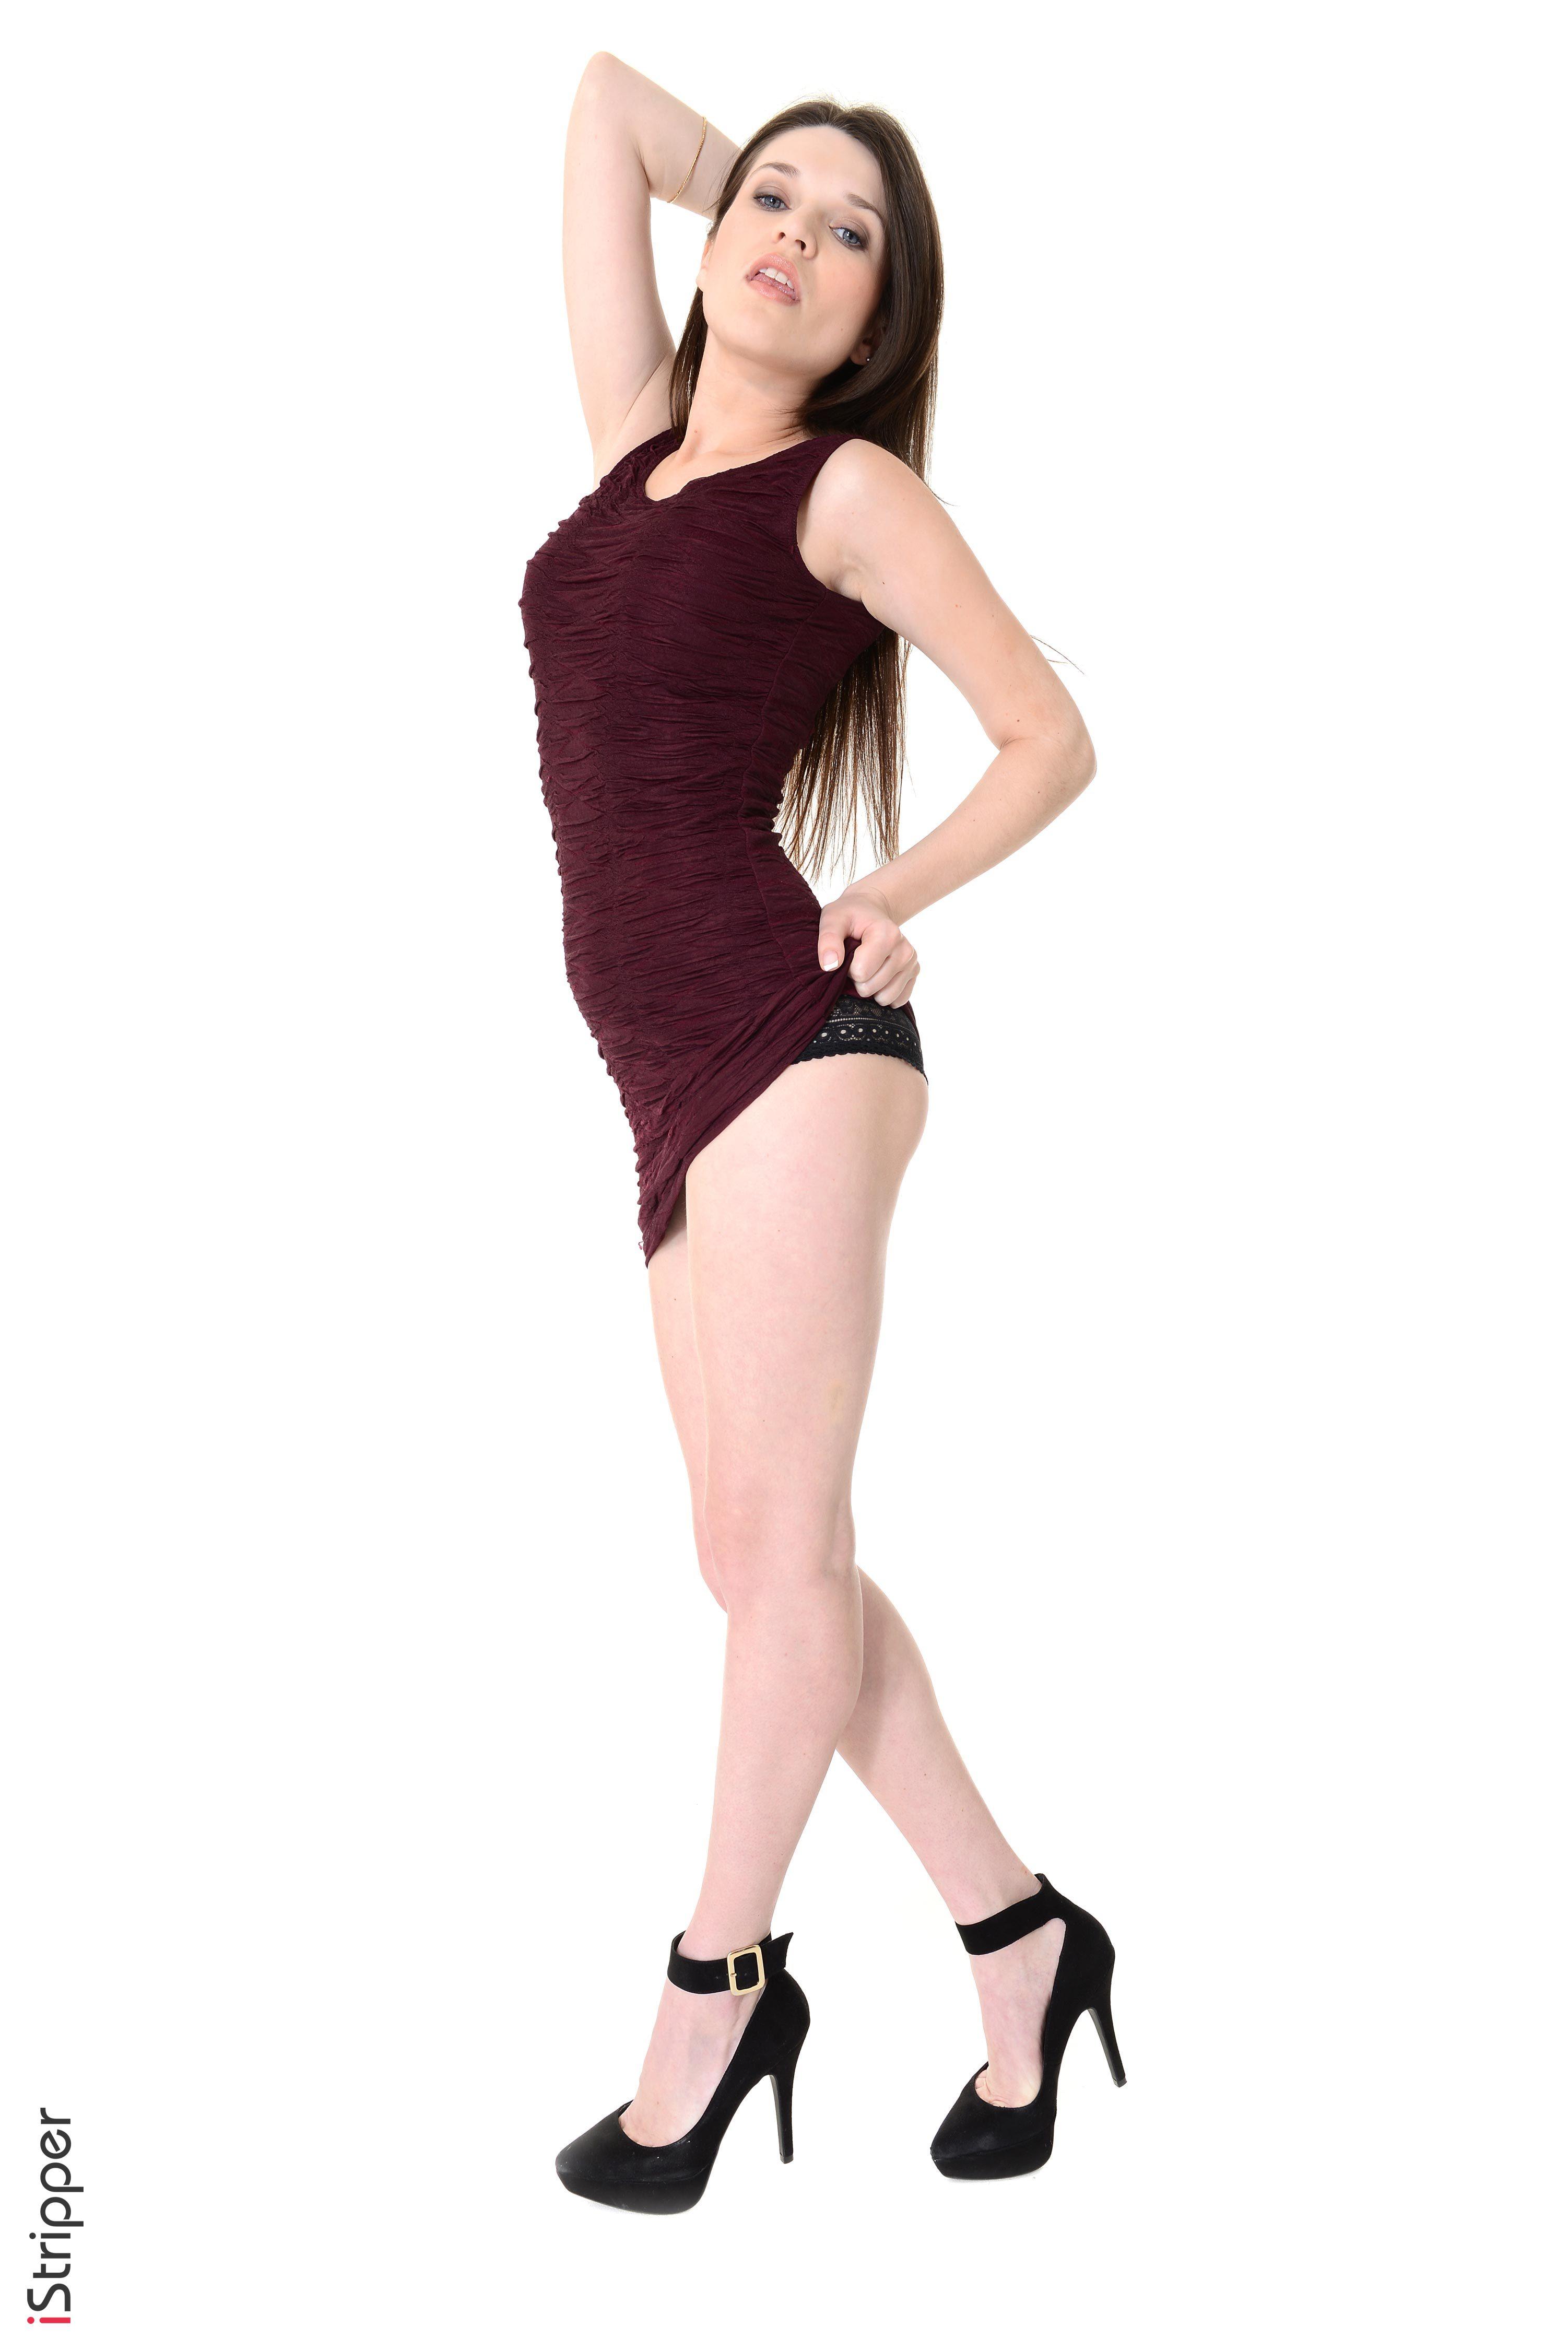 girls stripping in public video